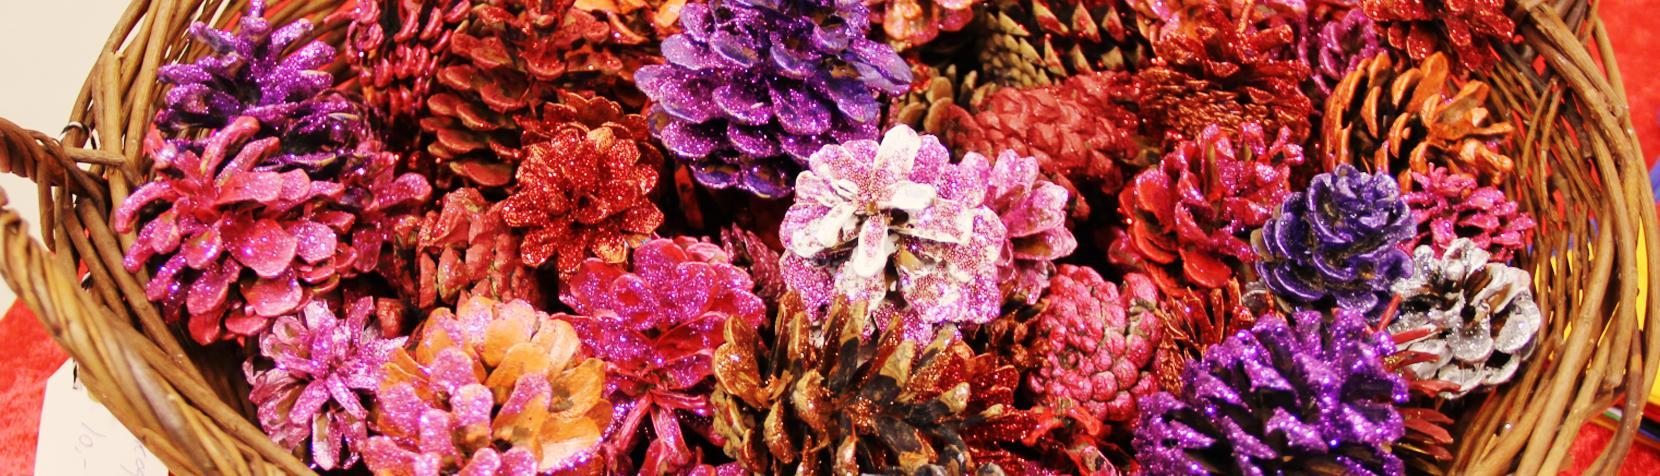 Grankogler dekoreret med maling og glimmer